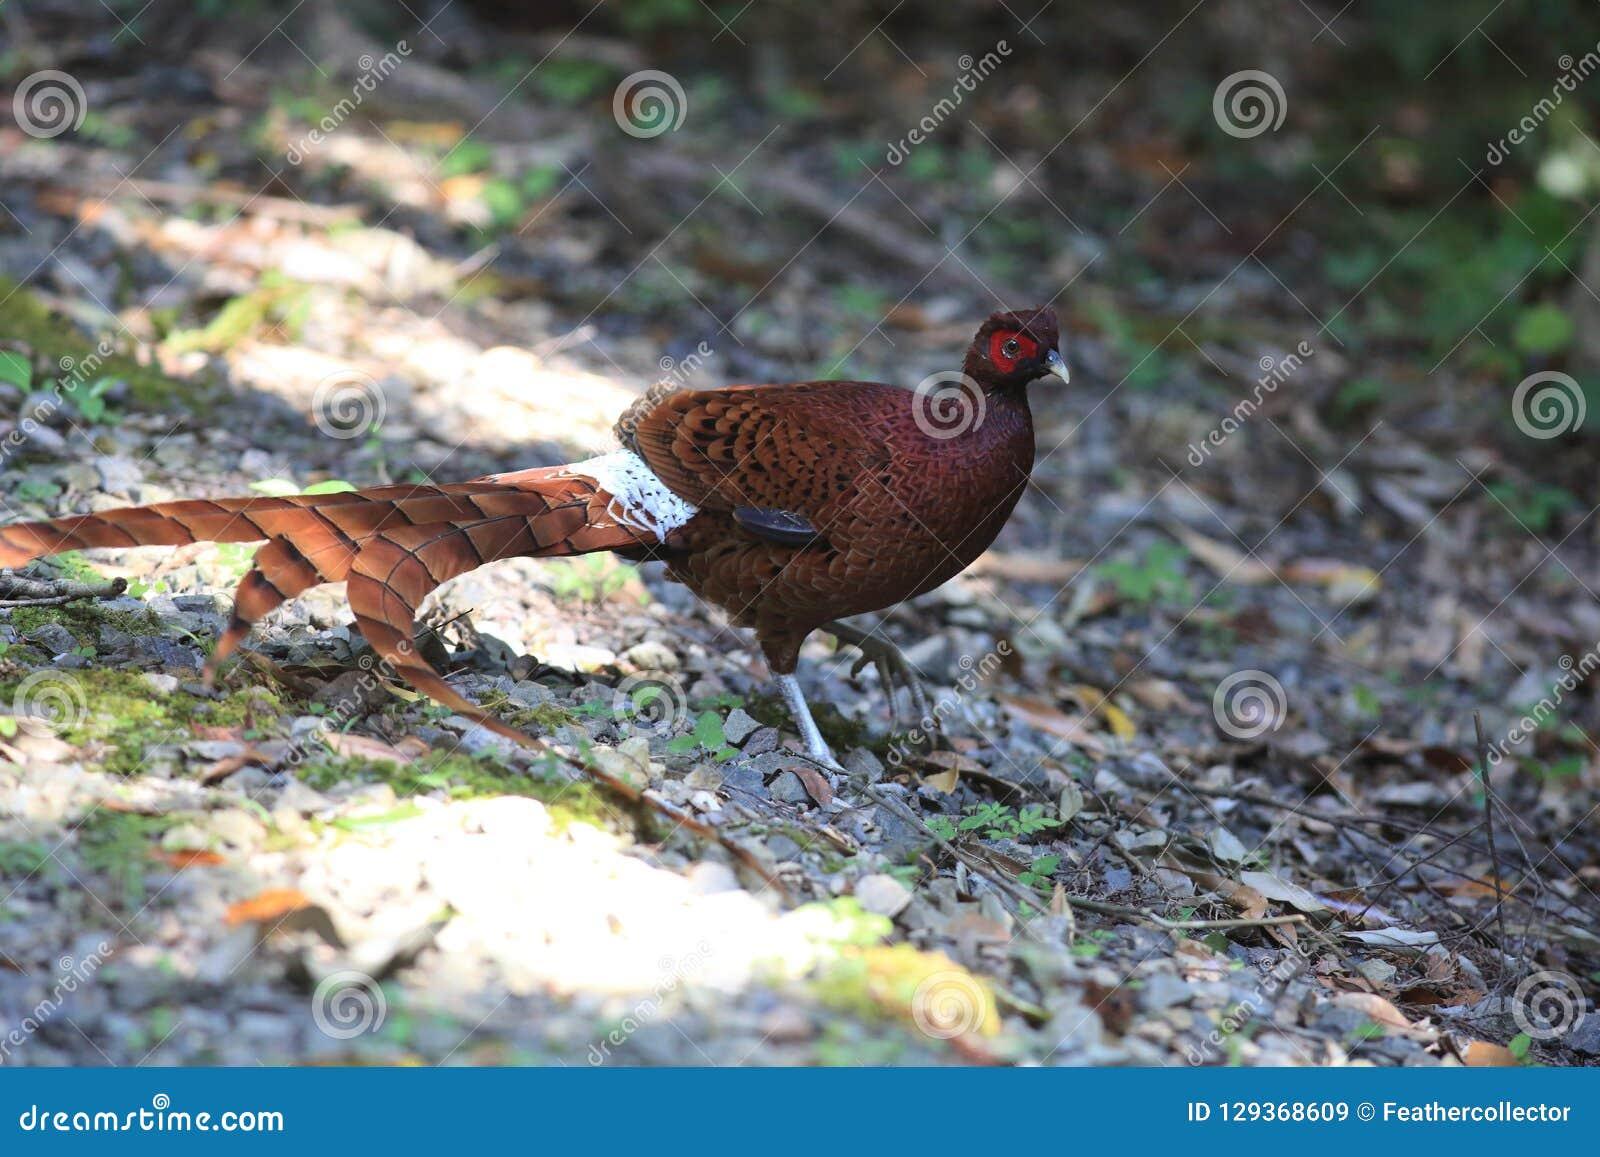 Copper Pheasant male in South Kyushu, Japan